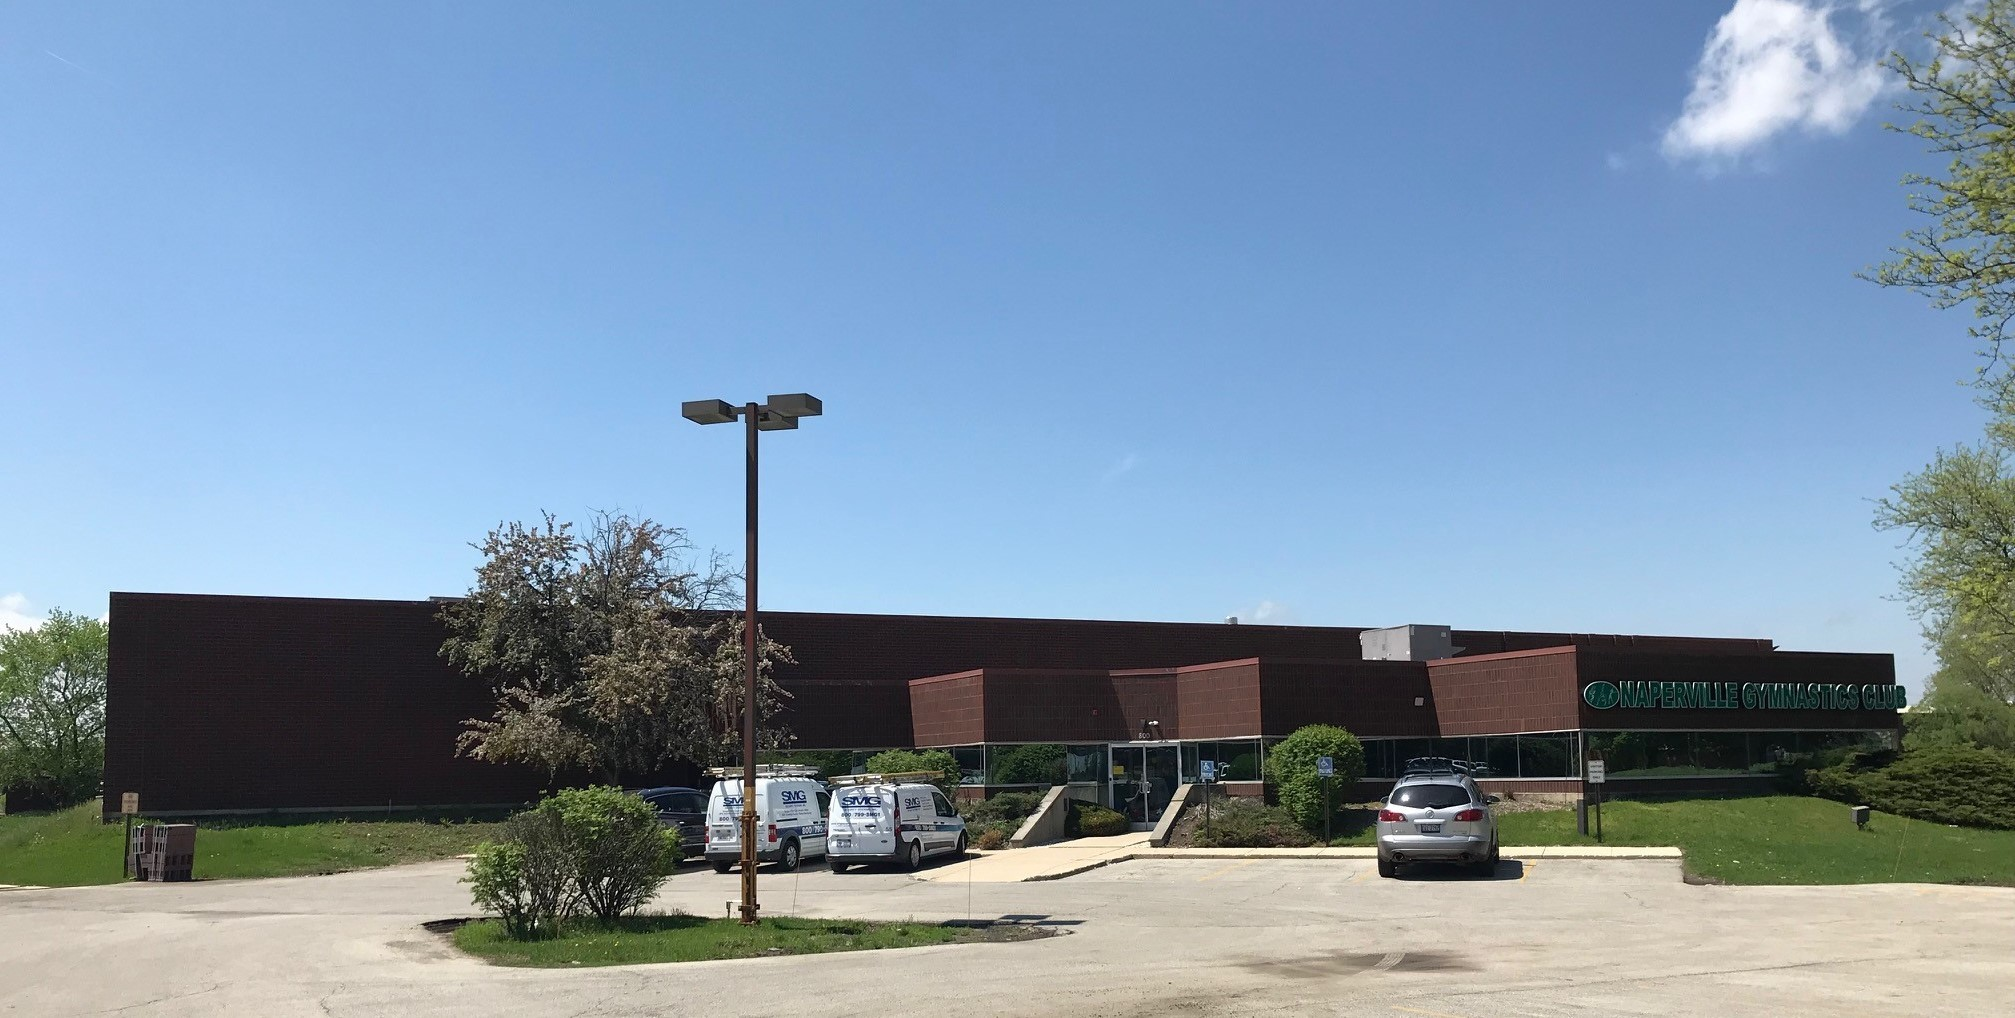 800 Enterprise_Naperville_Cawley Chicago Commercial Real Estate